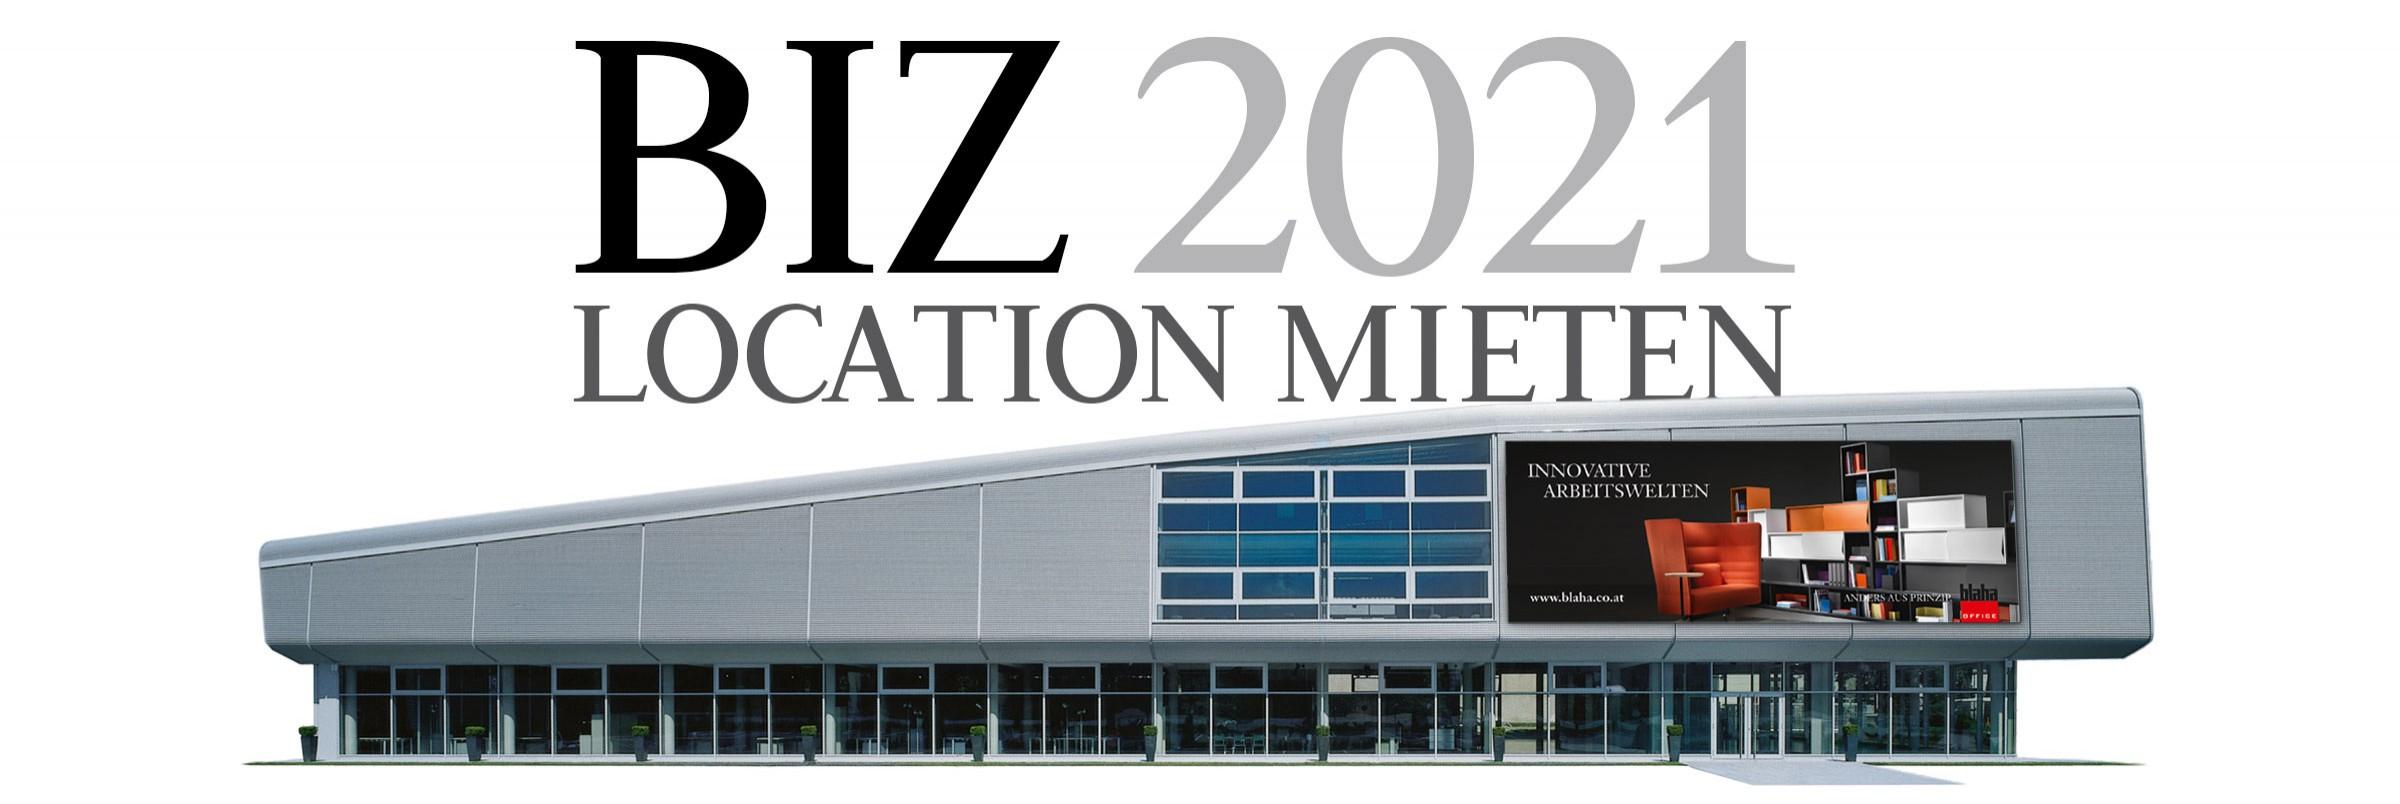 biz 2021 header location mieten blaha buero